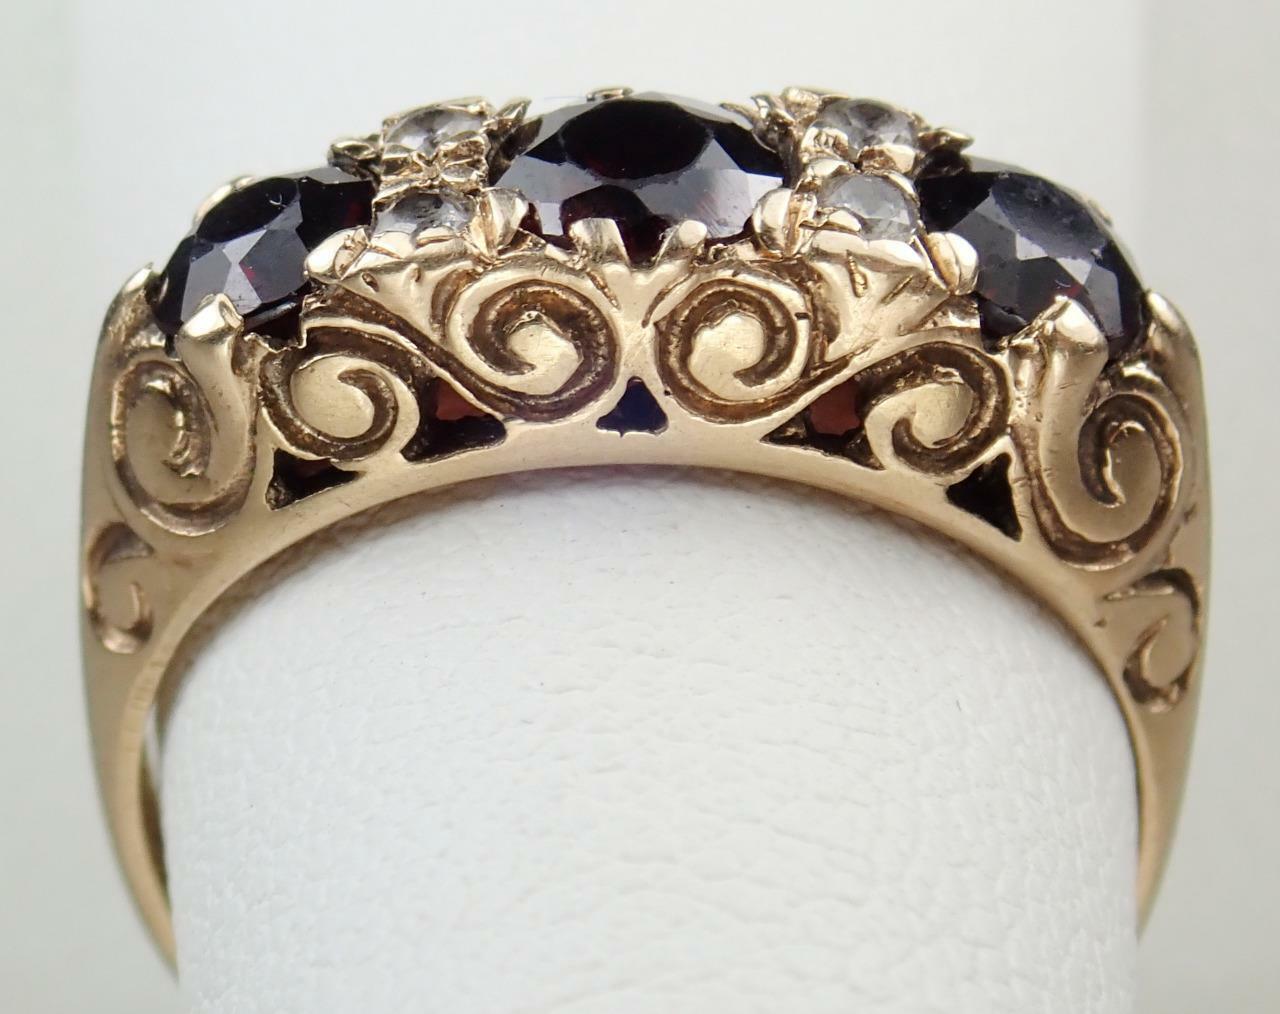 Fabulous Vintage Estate 9K Gold 1.4ct Garnet Crys… - image 10